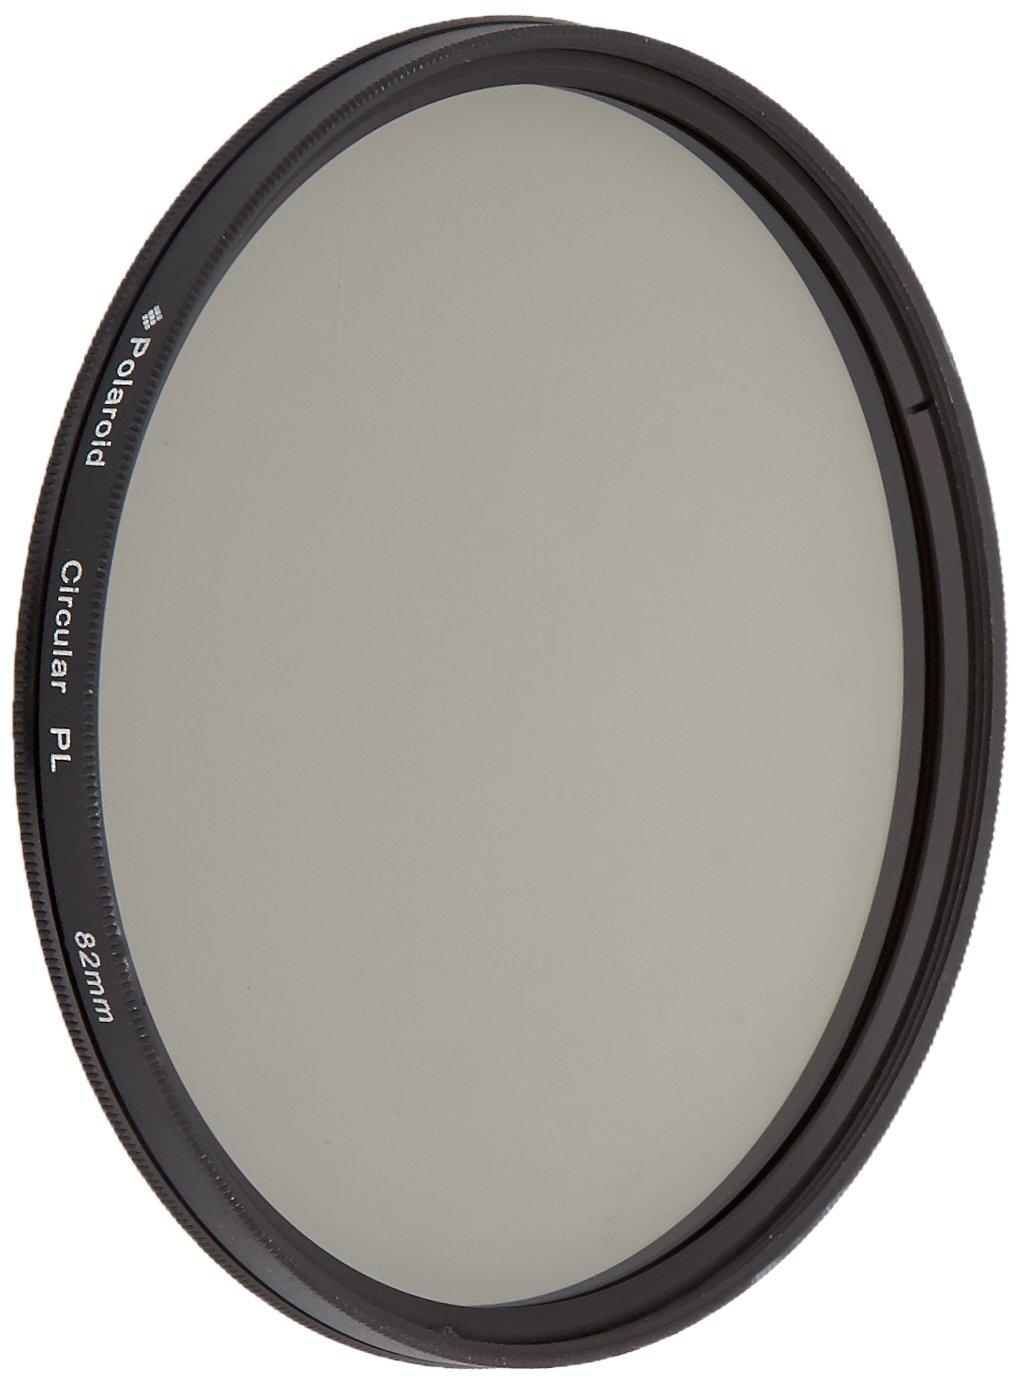 Polaroid Optics 82mm CPL Circular Polarizer Filter by Polaroid